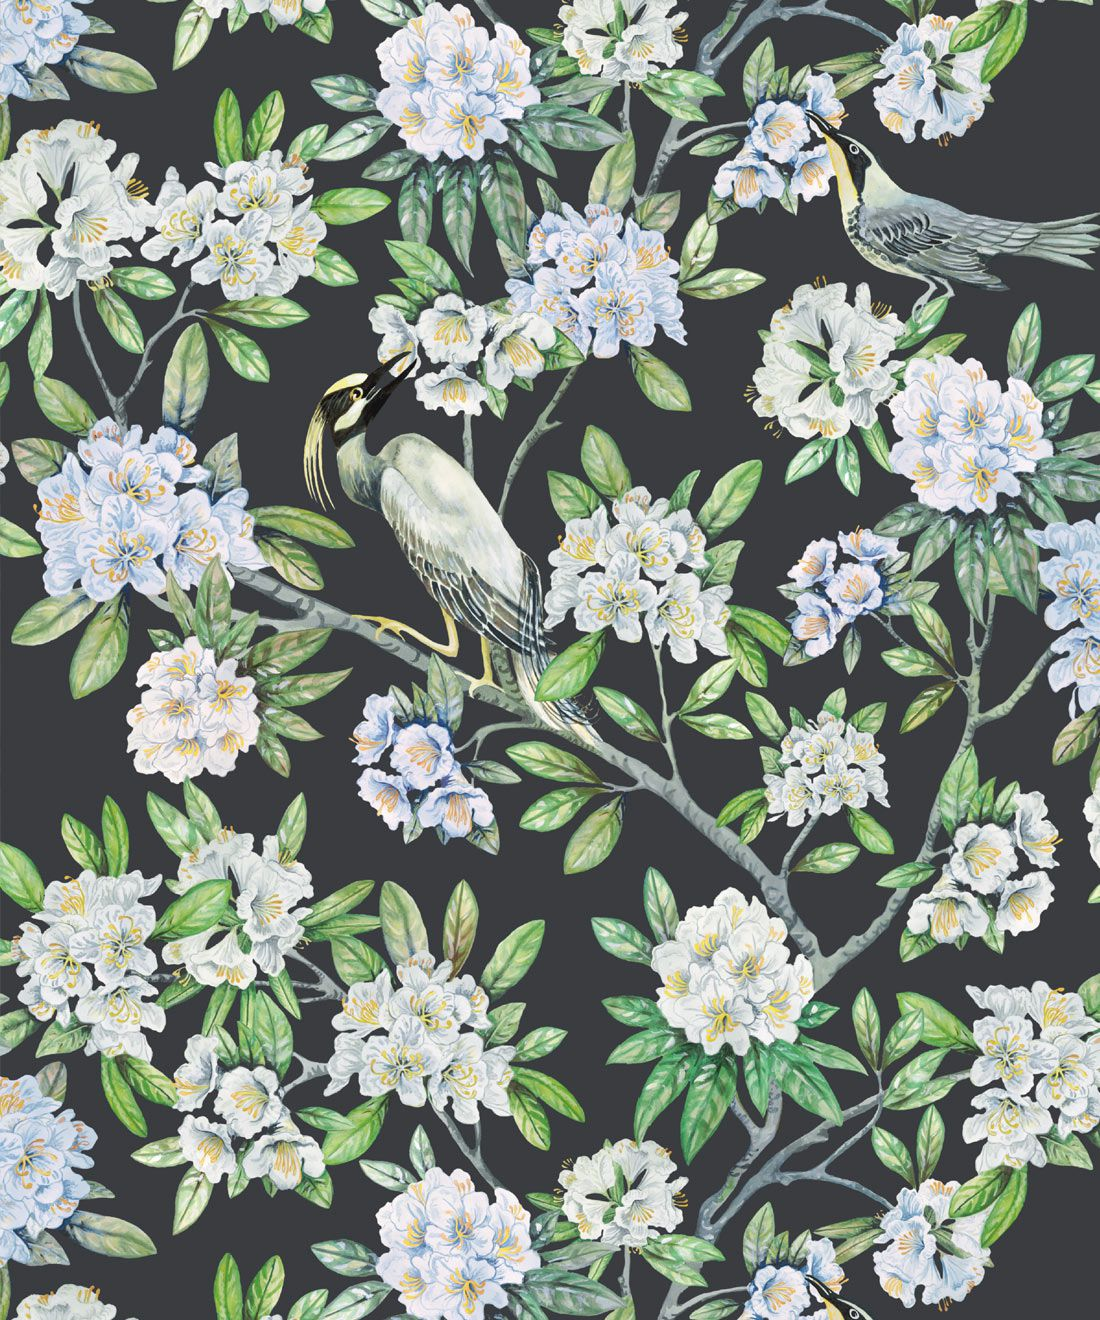 Victoria Wallpaper • Floral Wallpaper • Charcoal Wallpaper • Swatch